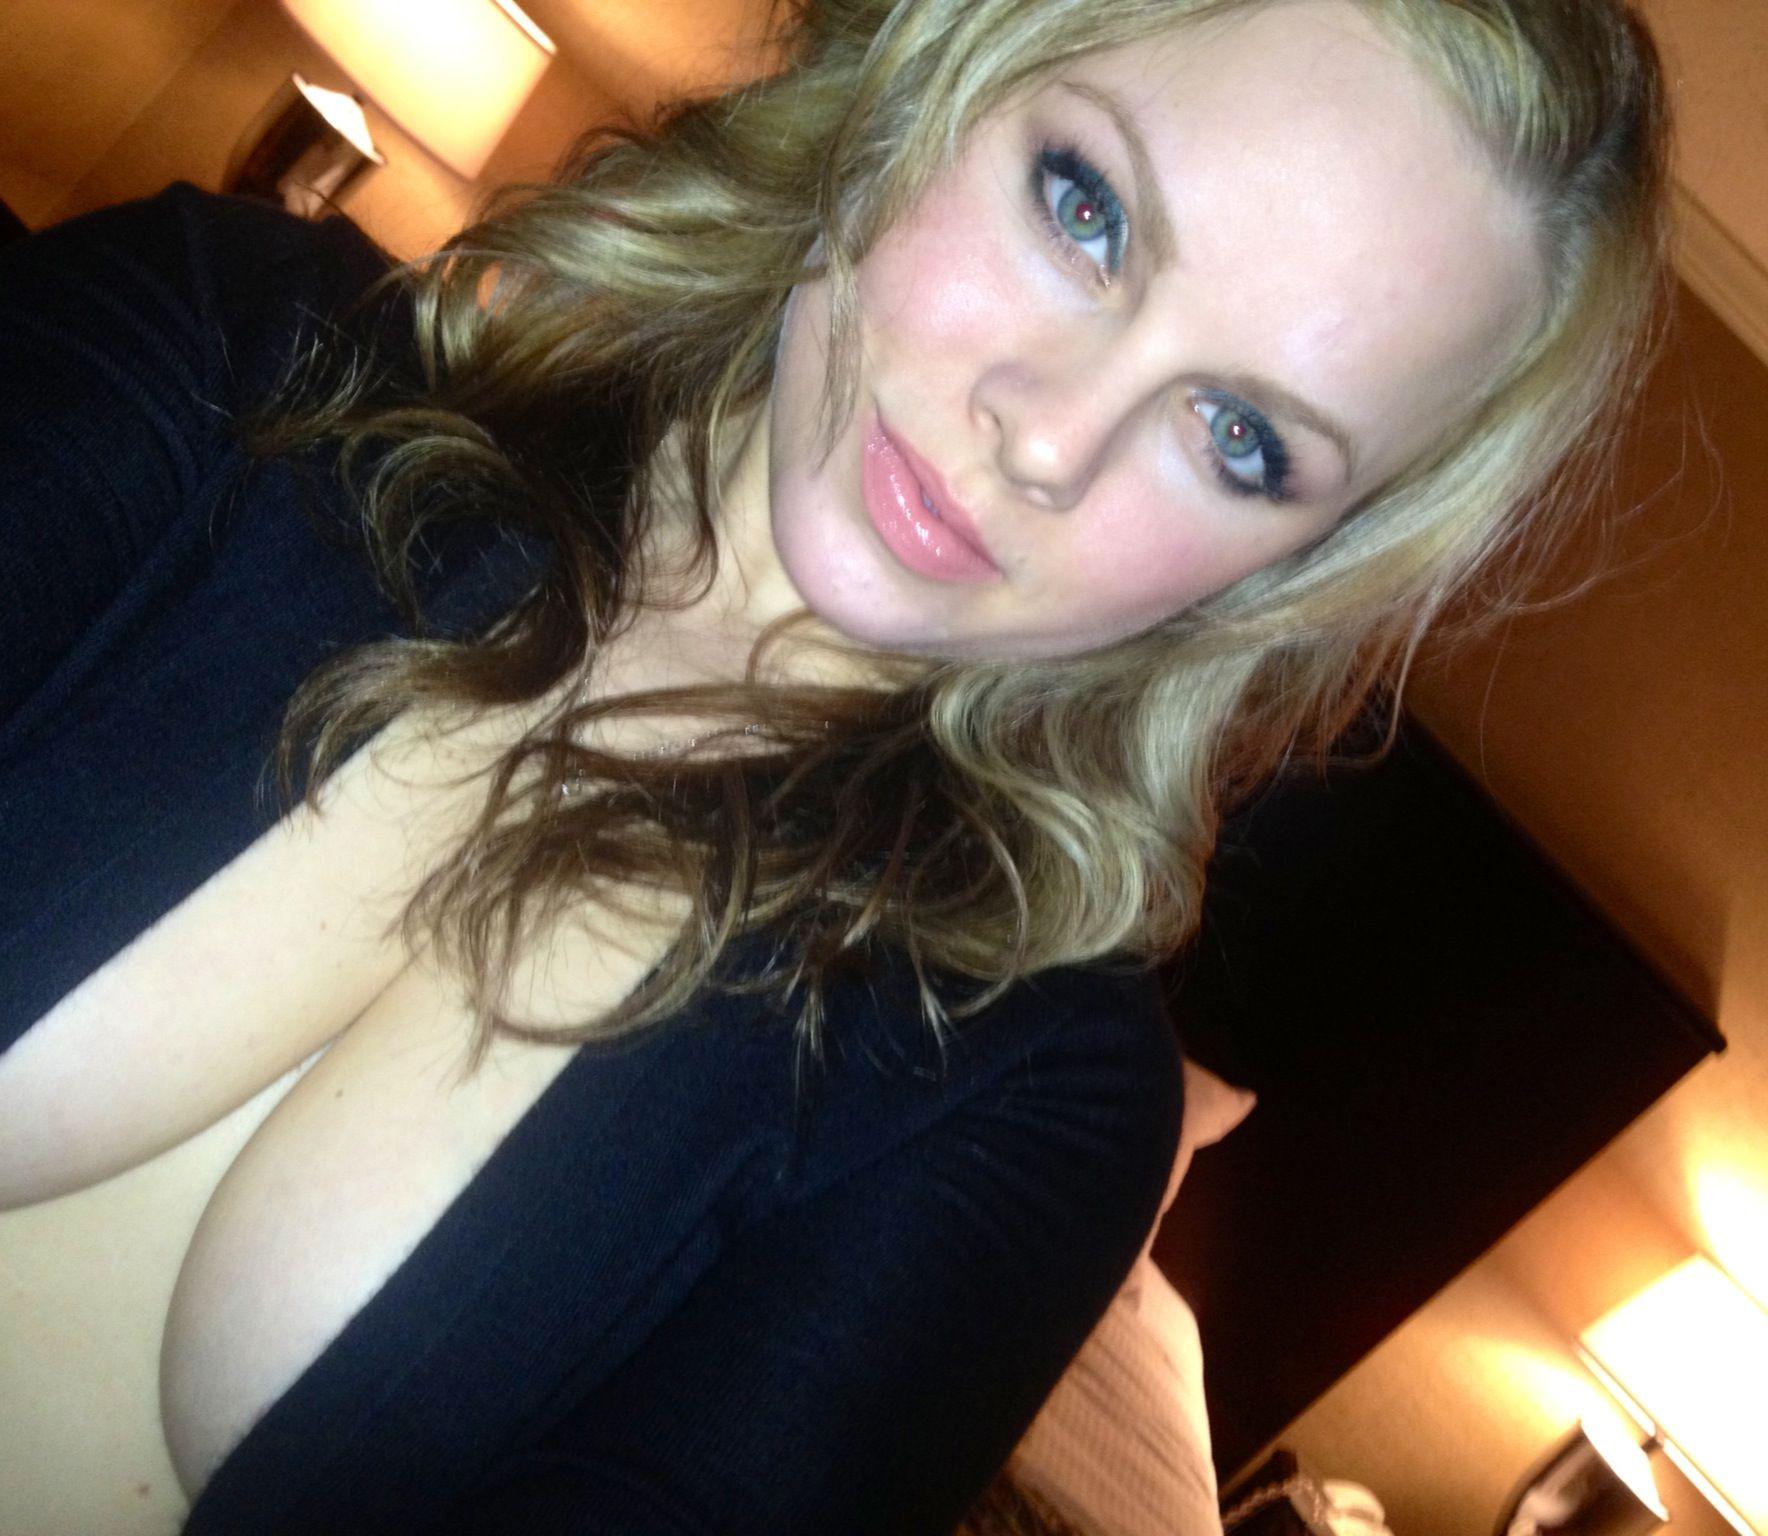 Kate Upton Nudes Naked Photos Leaked! Big Pack